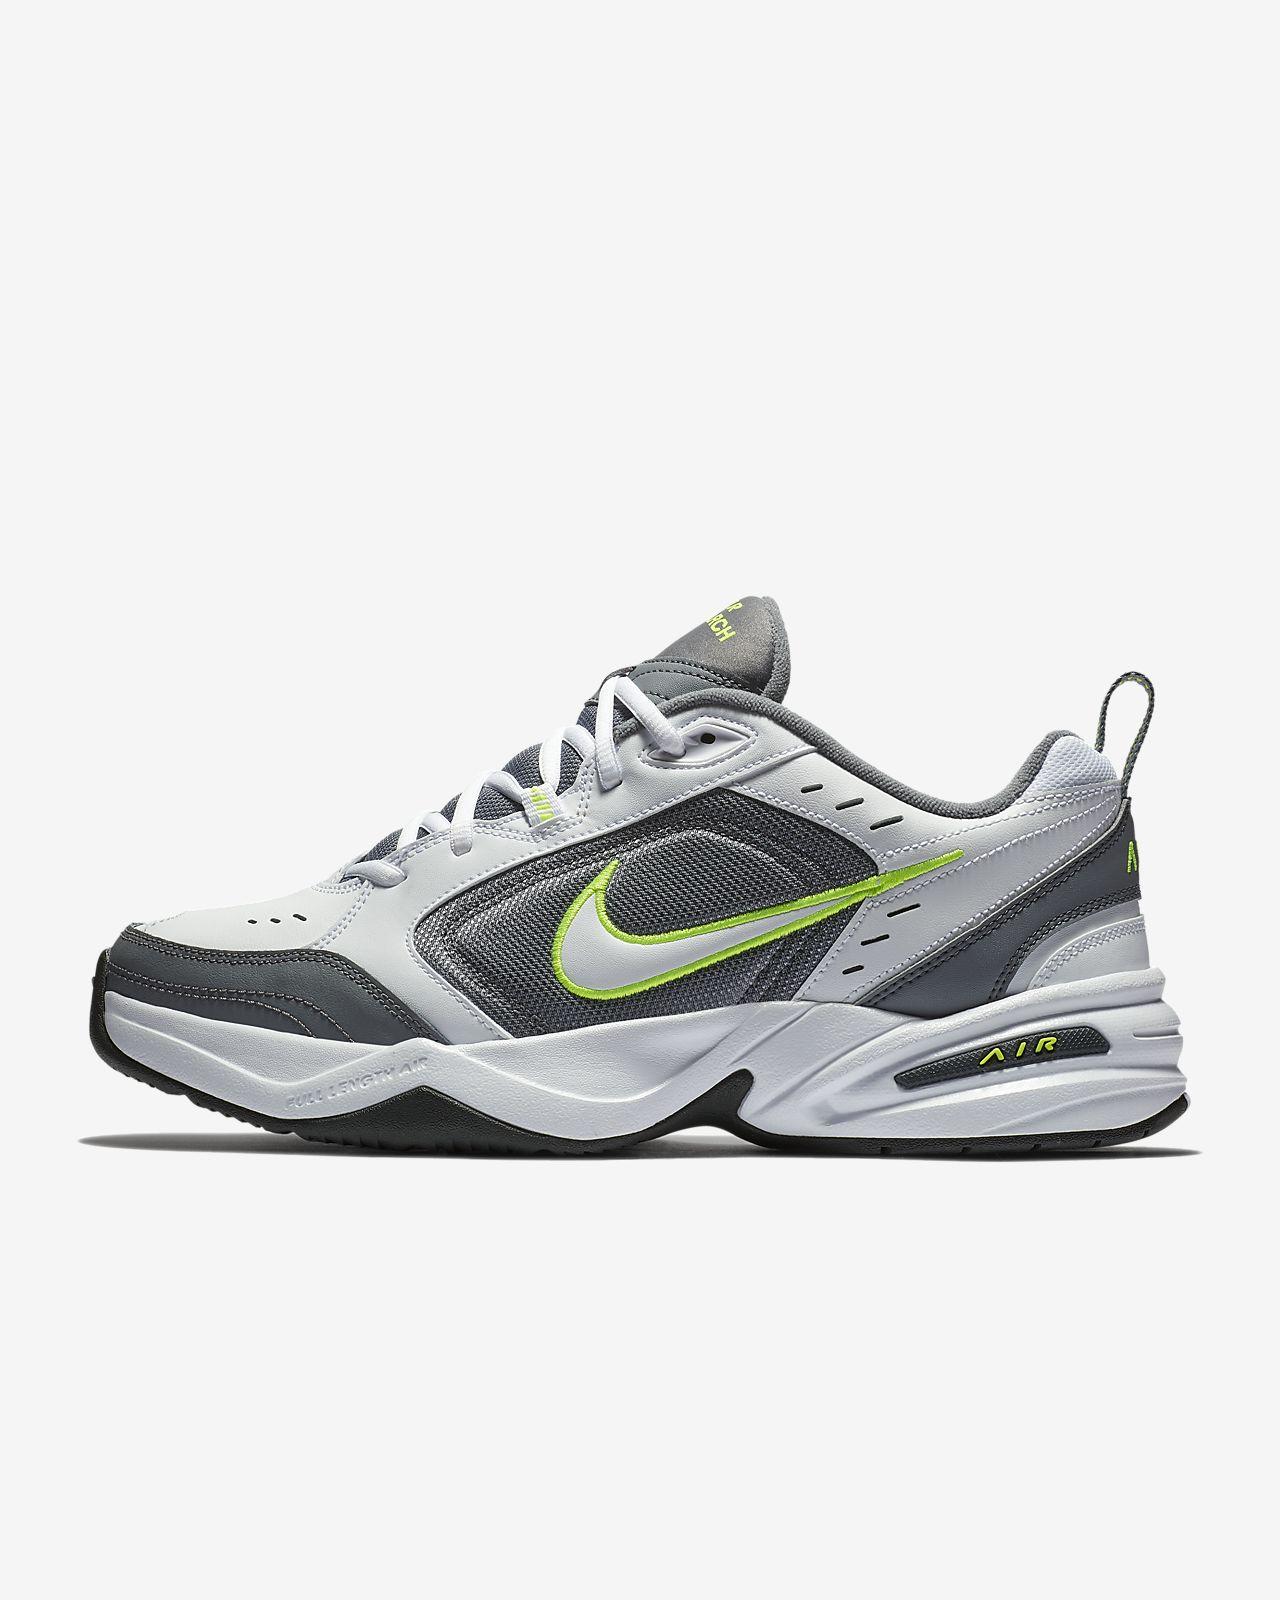 Nike Air Monarch IV Herren-Trainingsschuh